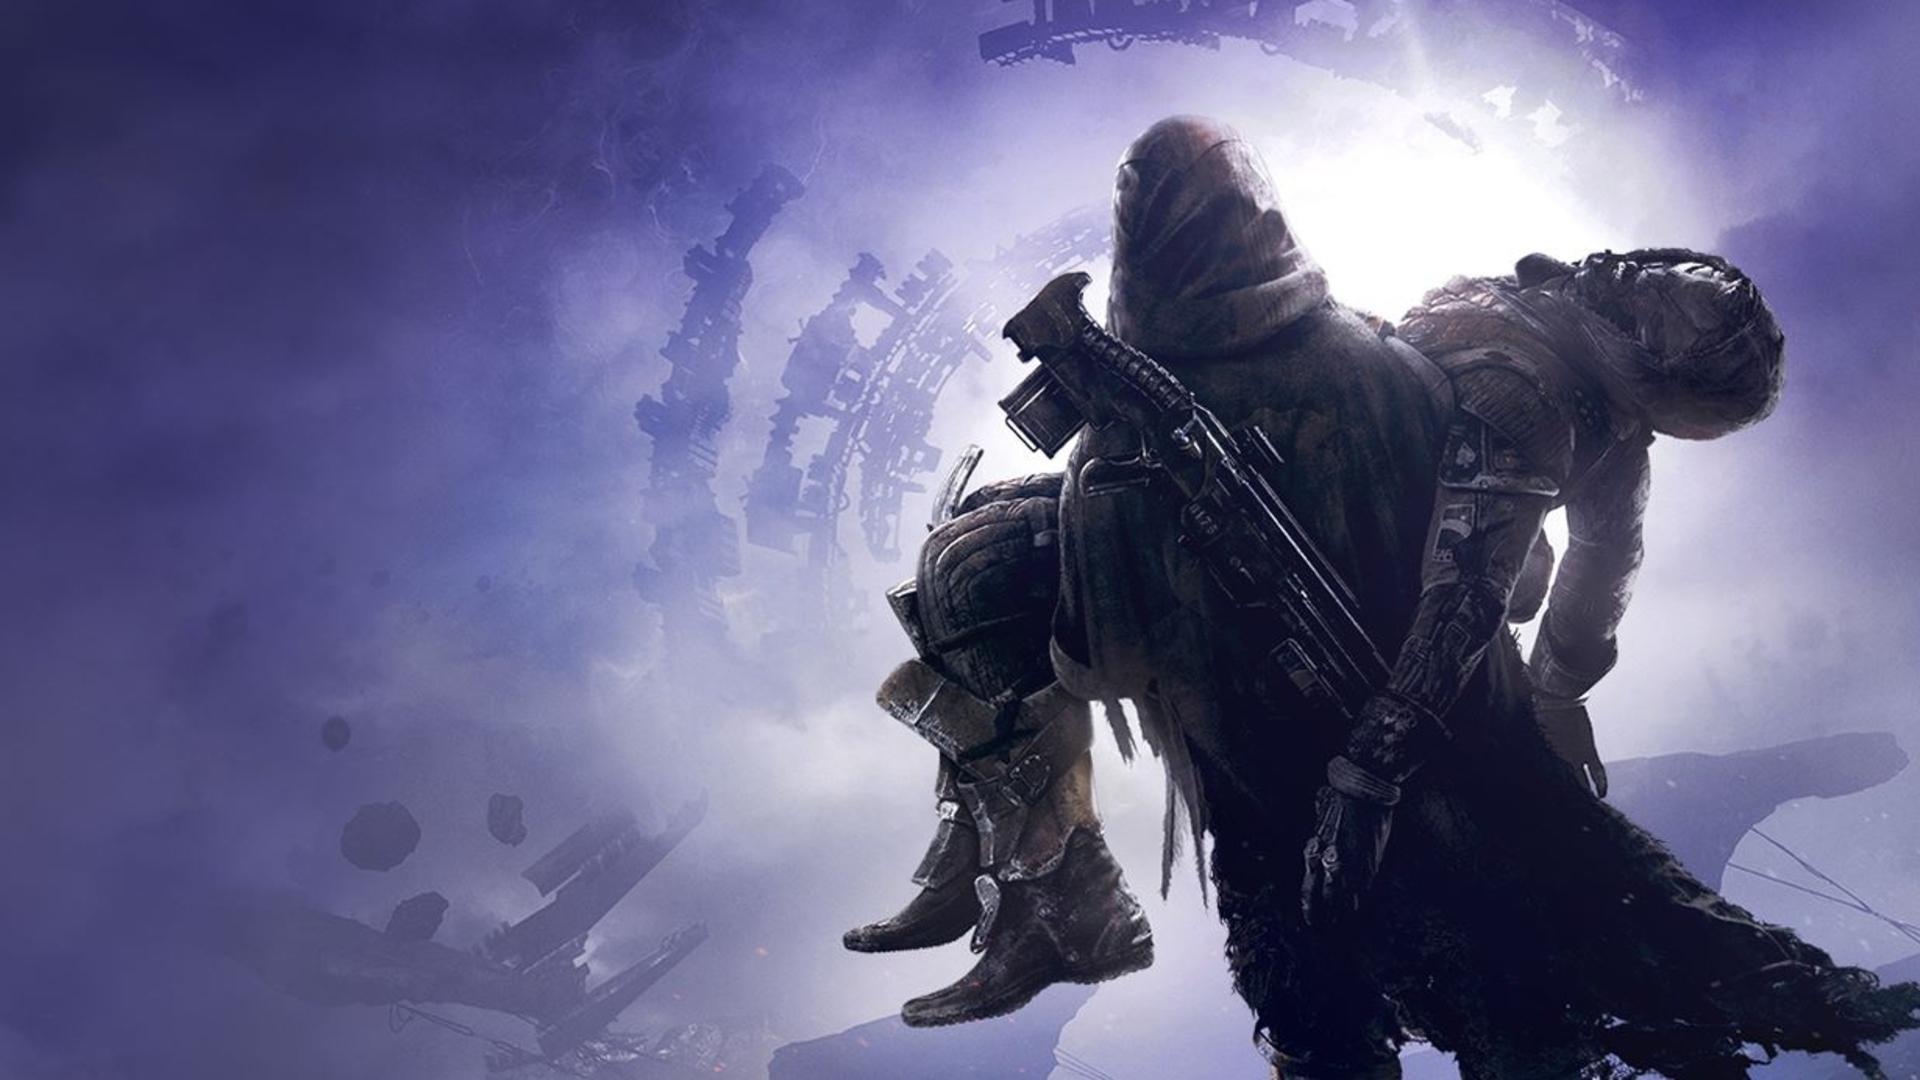 Destiny 2 2019 Game Wallpapers Wallpaper Cave